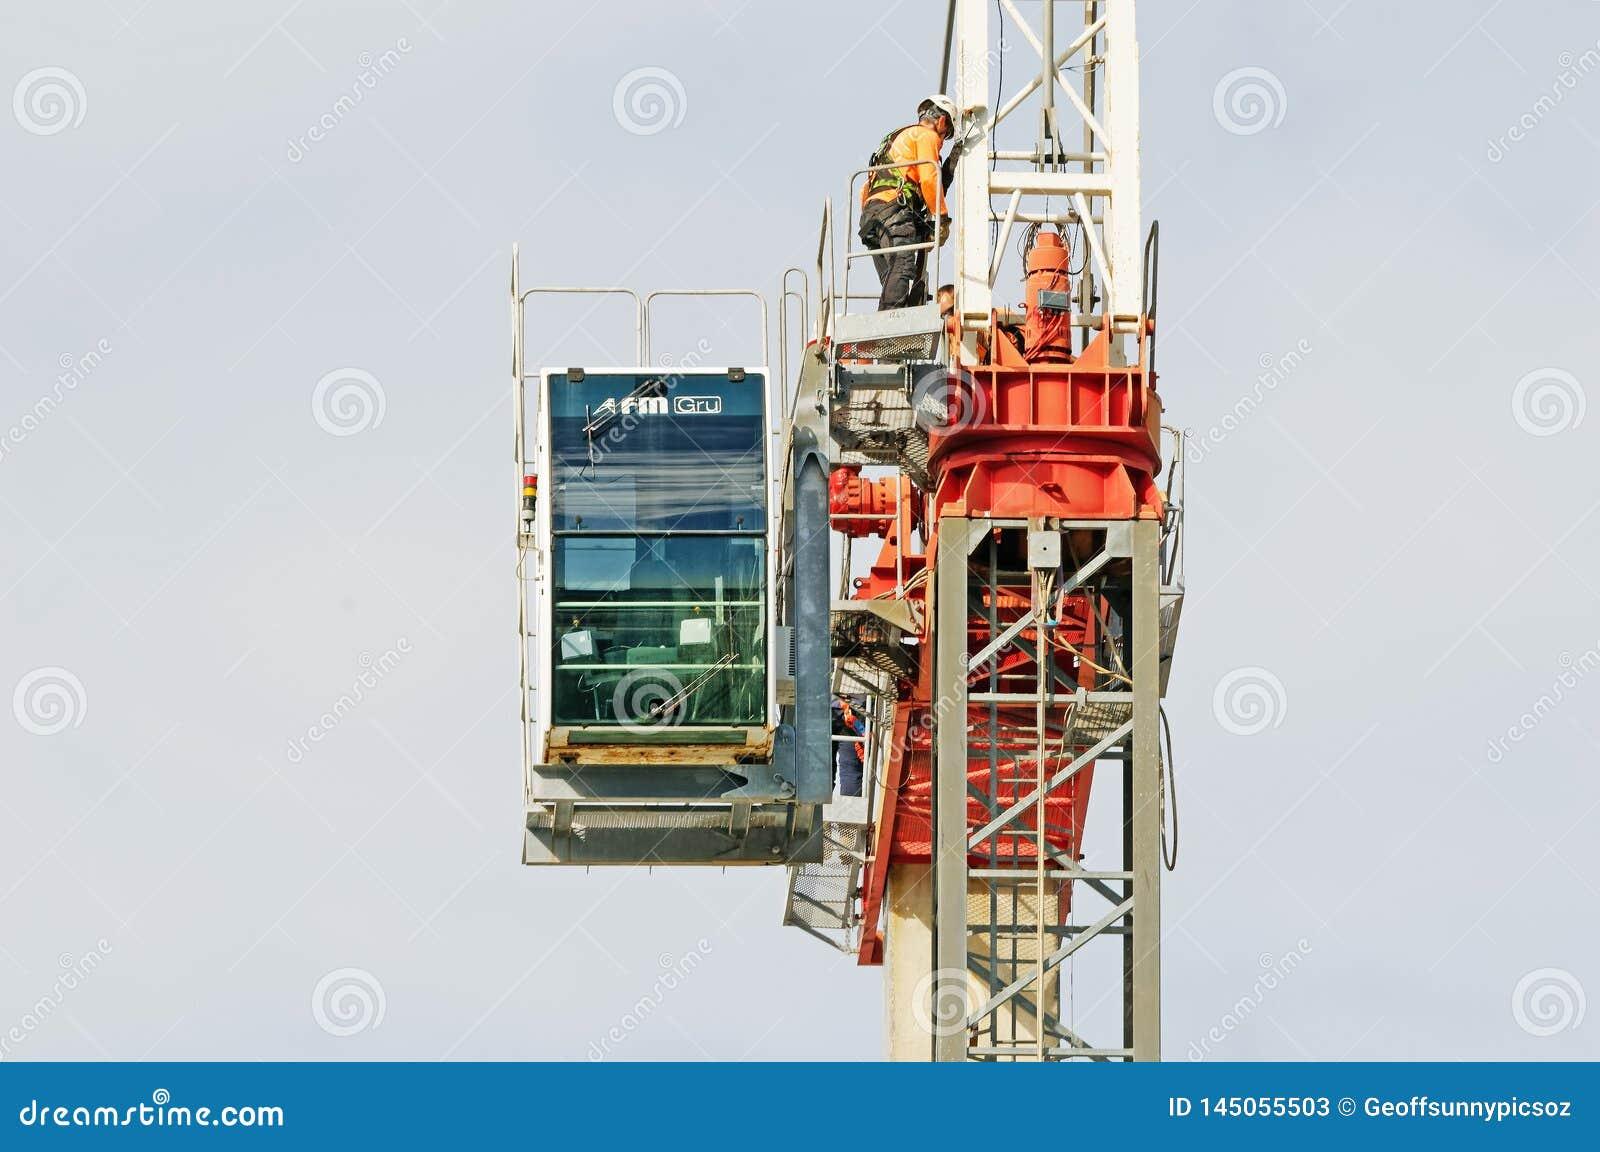 Construction crane removal. Update ed309. Gosford. April 9, 2019